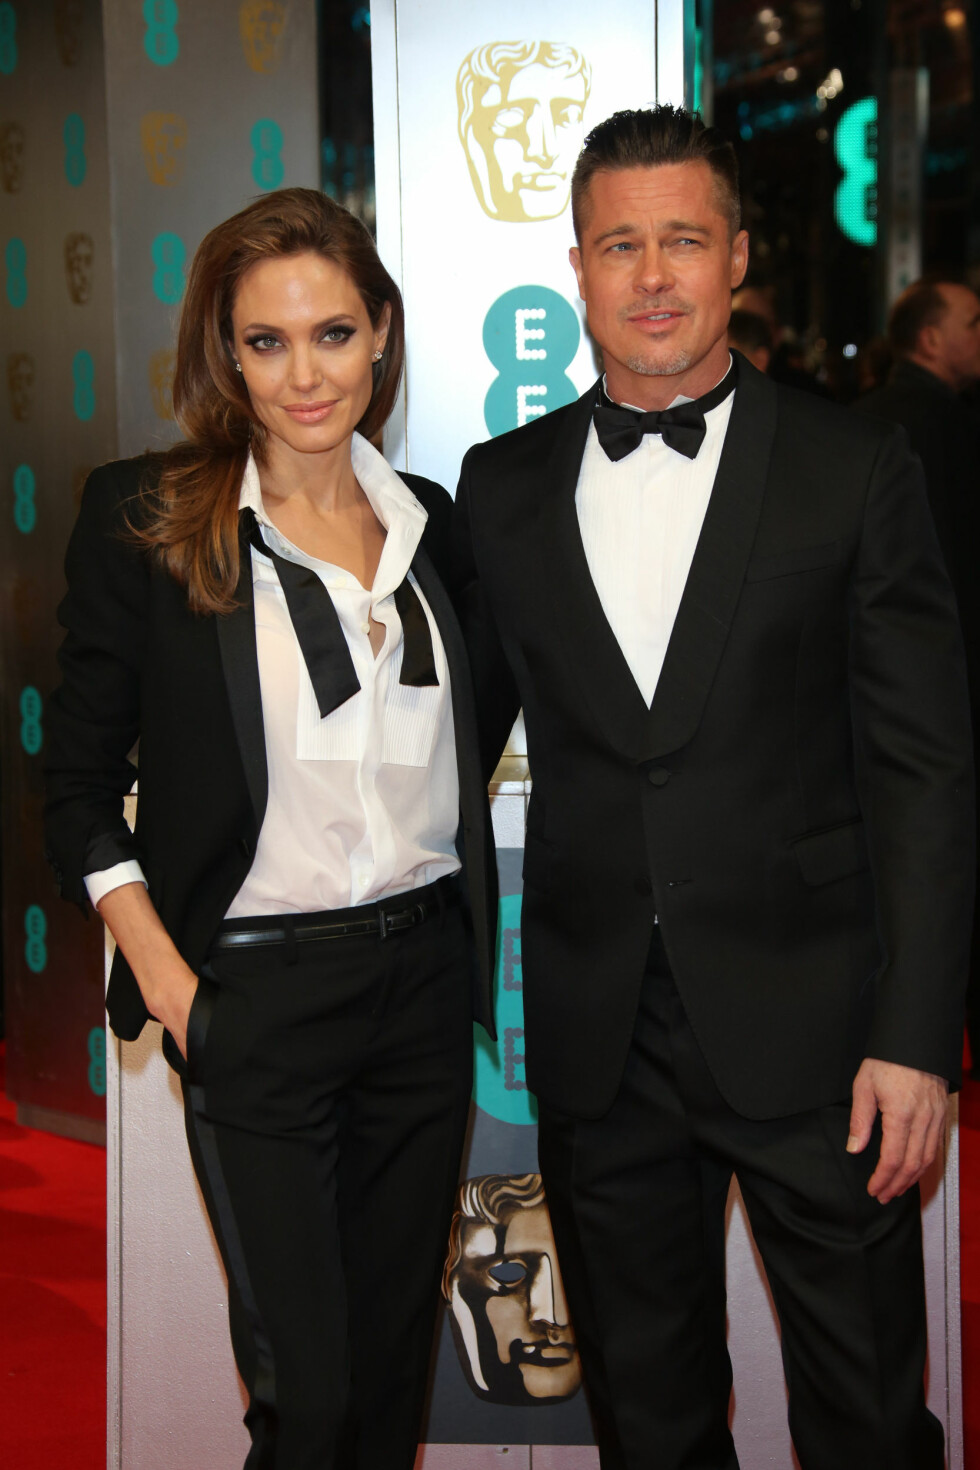 PAR I HJERTER: Angelina Jolie og Brad Pitt. Foto: NTB Scanpix